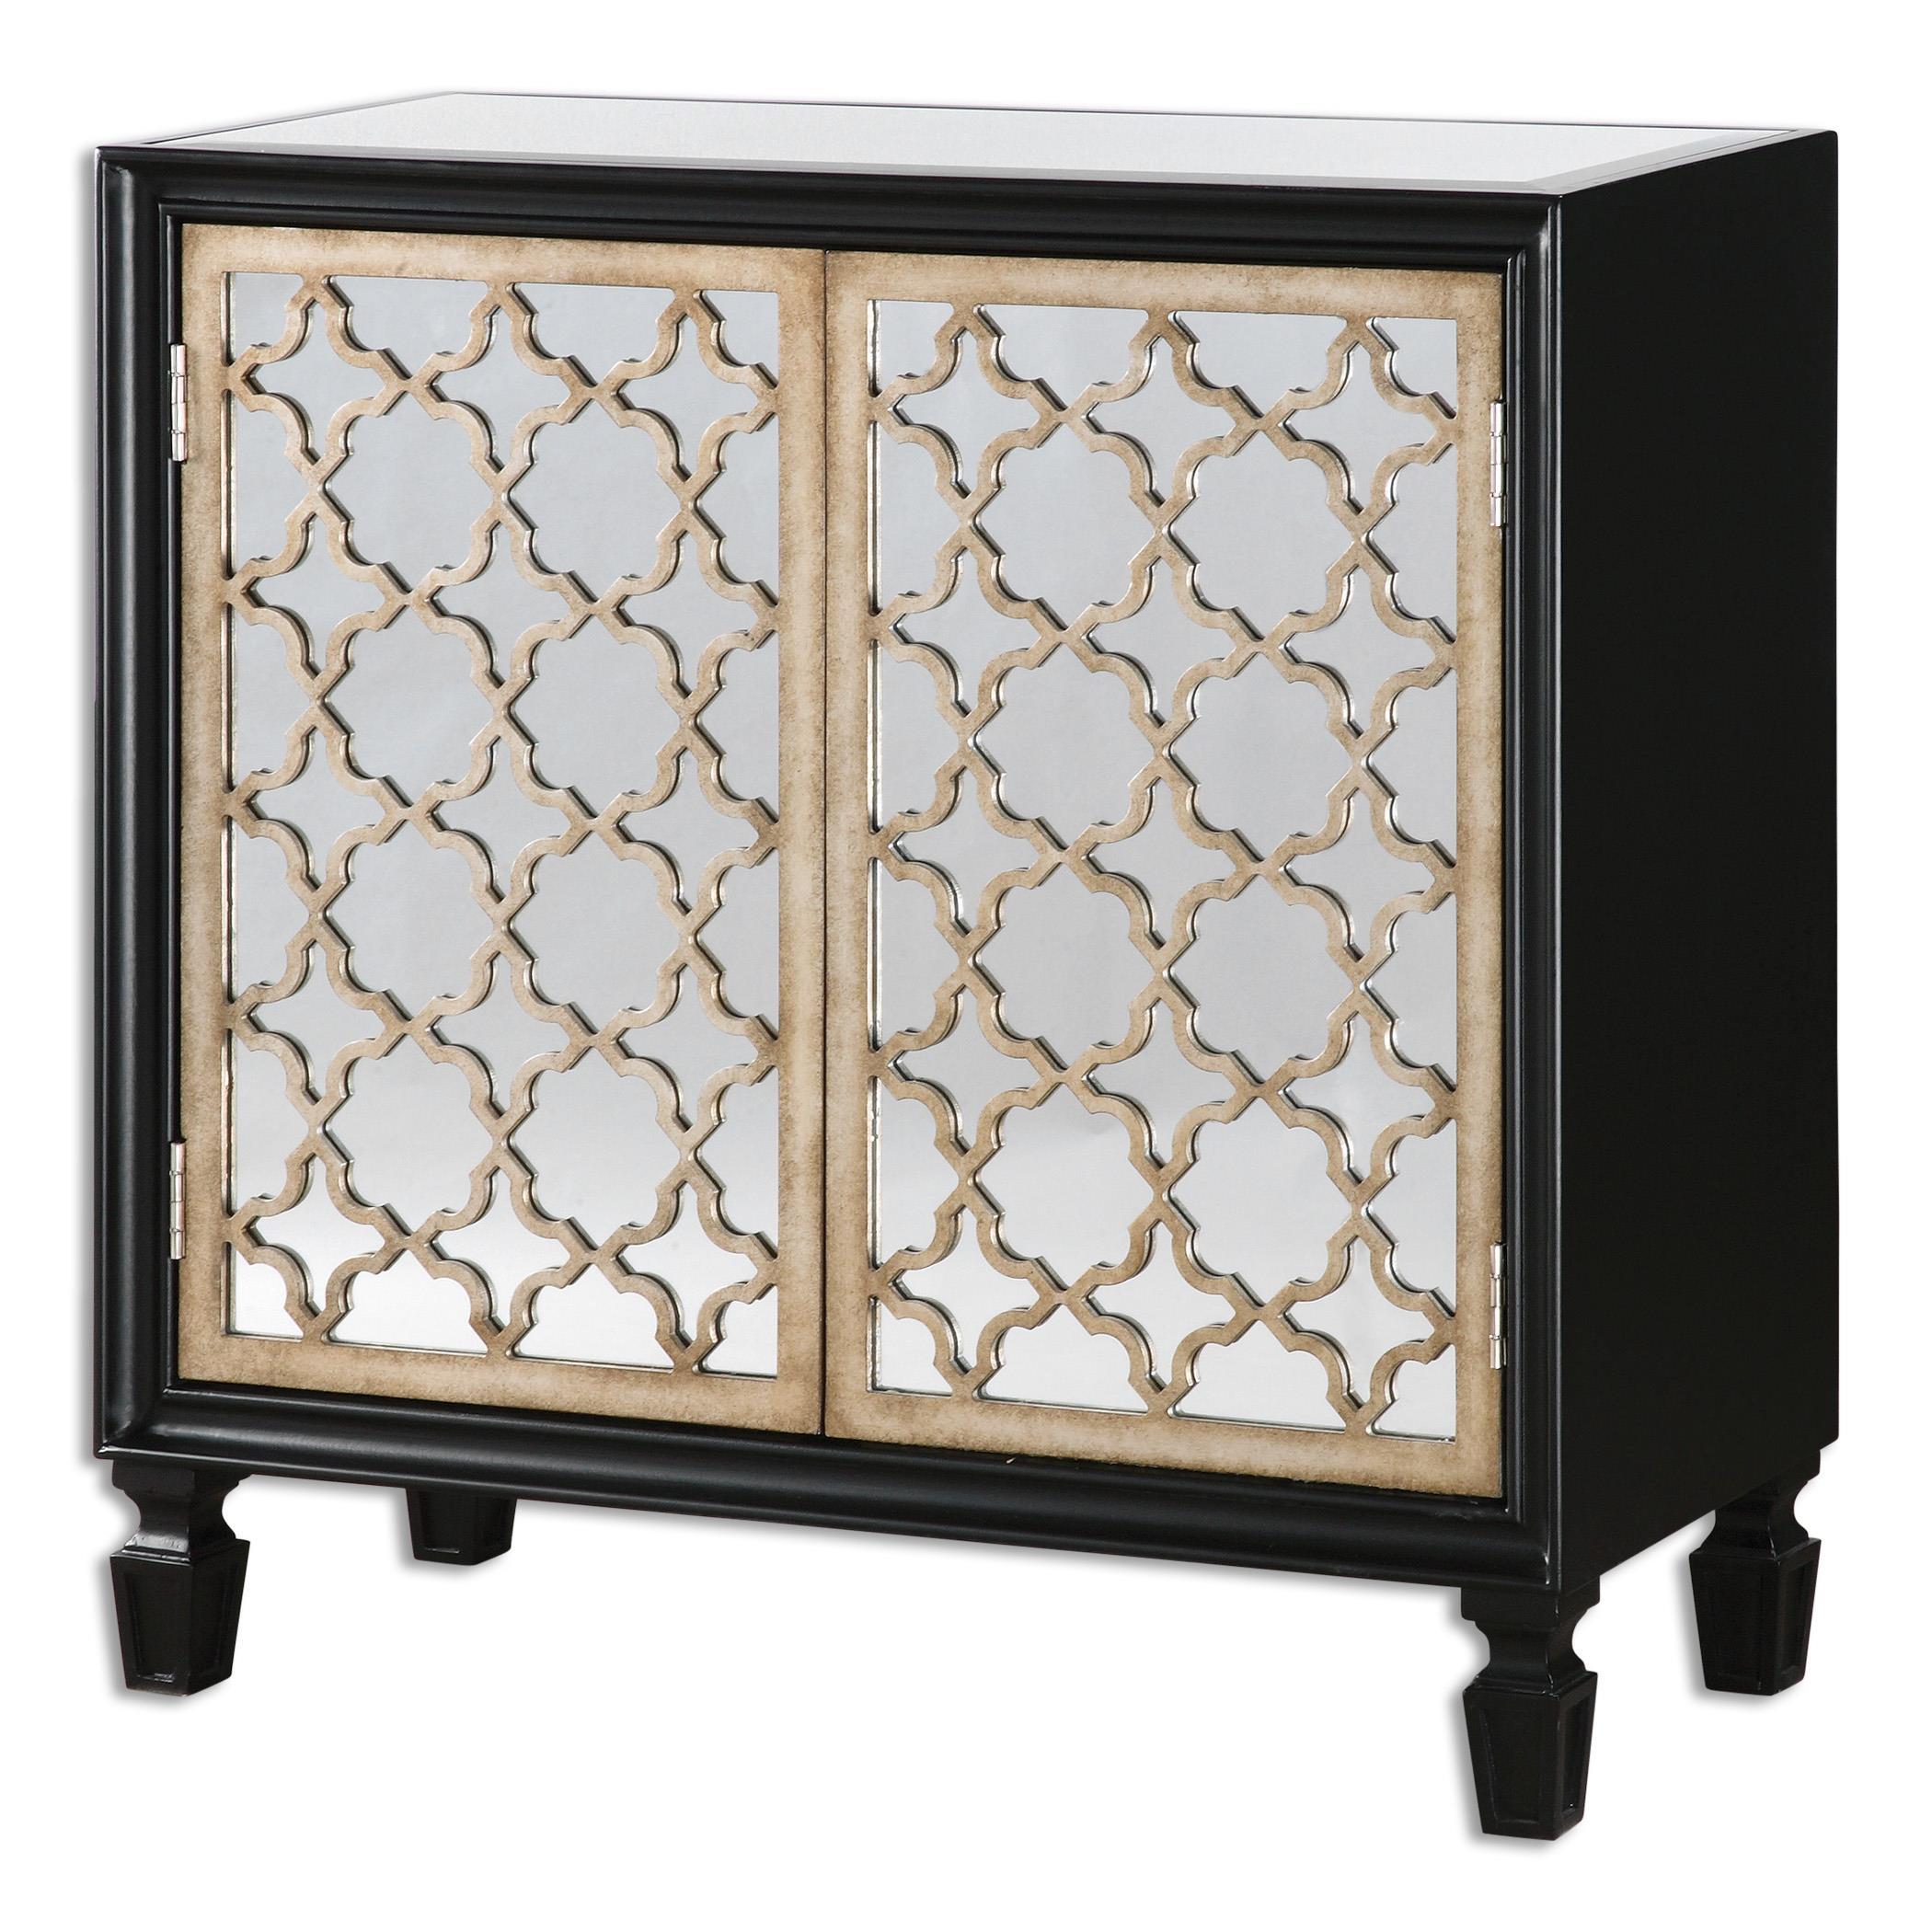 Uttermost Accent Furniture Franzea Mirrored Console Cabinet - Item Number: 24498